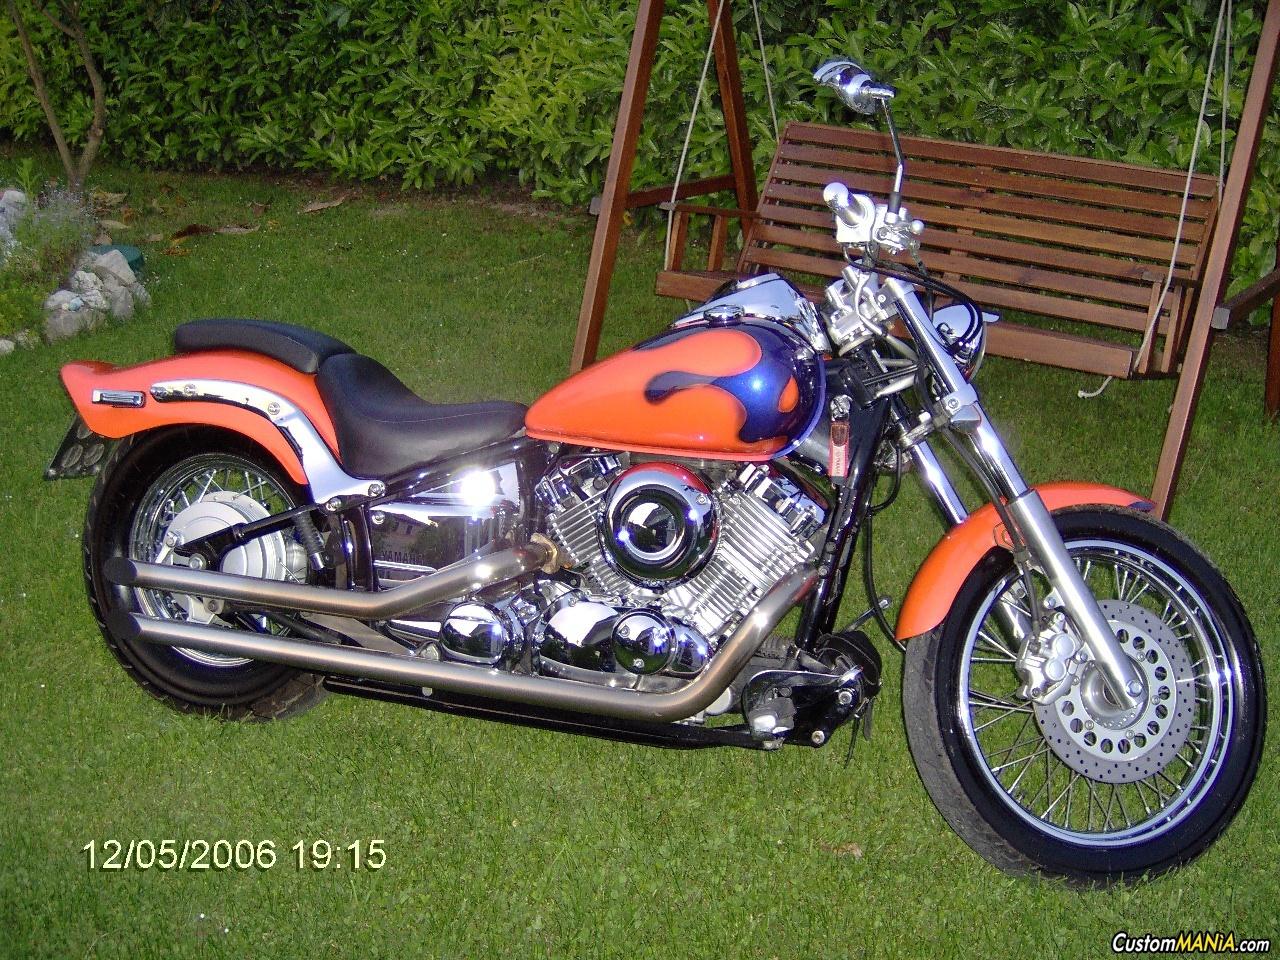 Schema Elettrico Yamaha Dragstar 650 : La vecchia arancione custommania